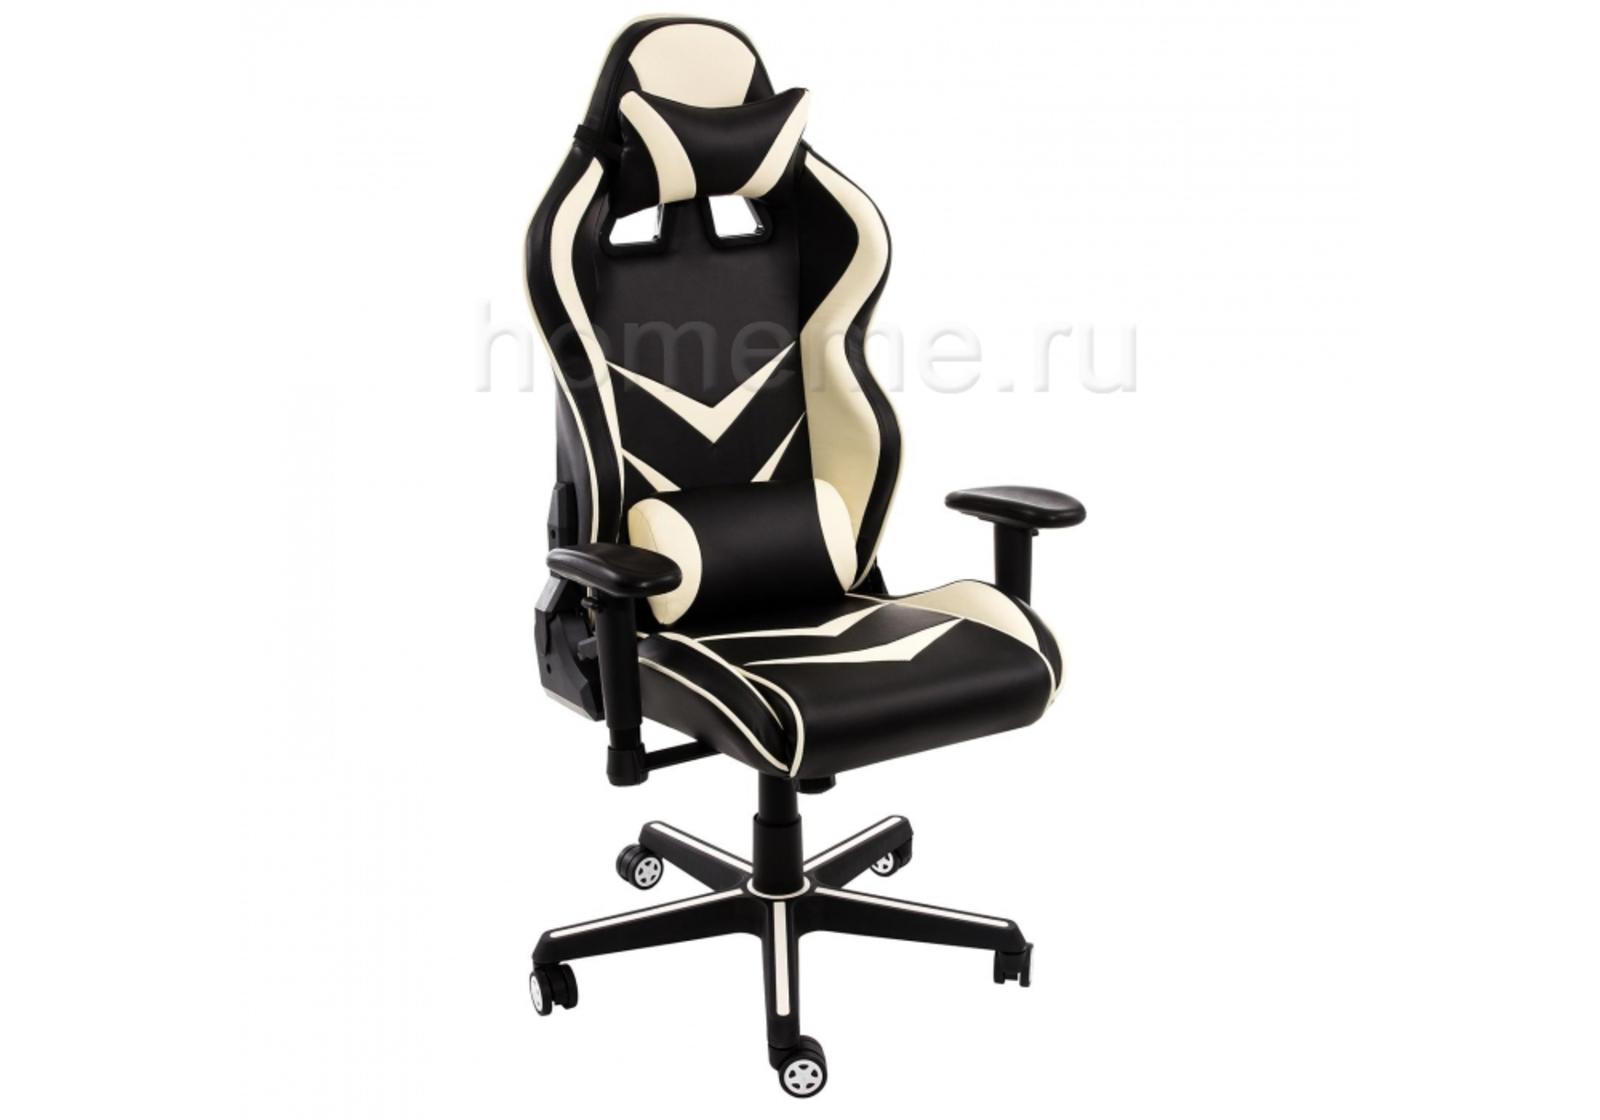 Кресло для офиса HomeMe Racer черное / бежевое 1857 от Homeme.ru